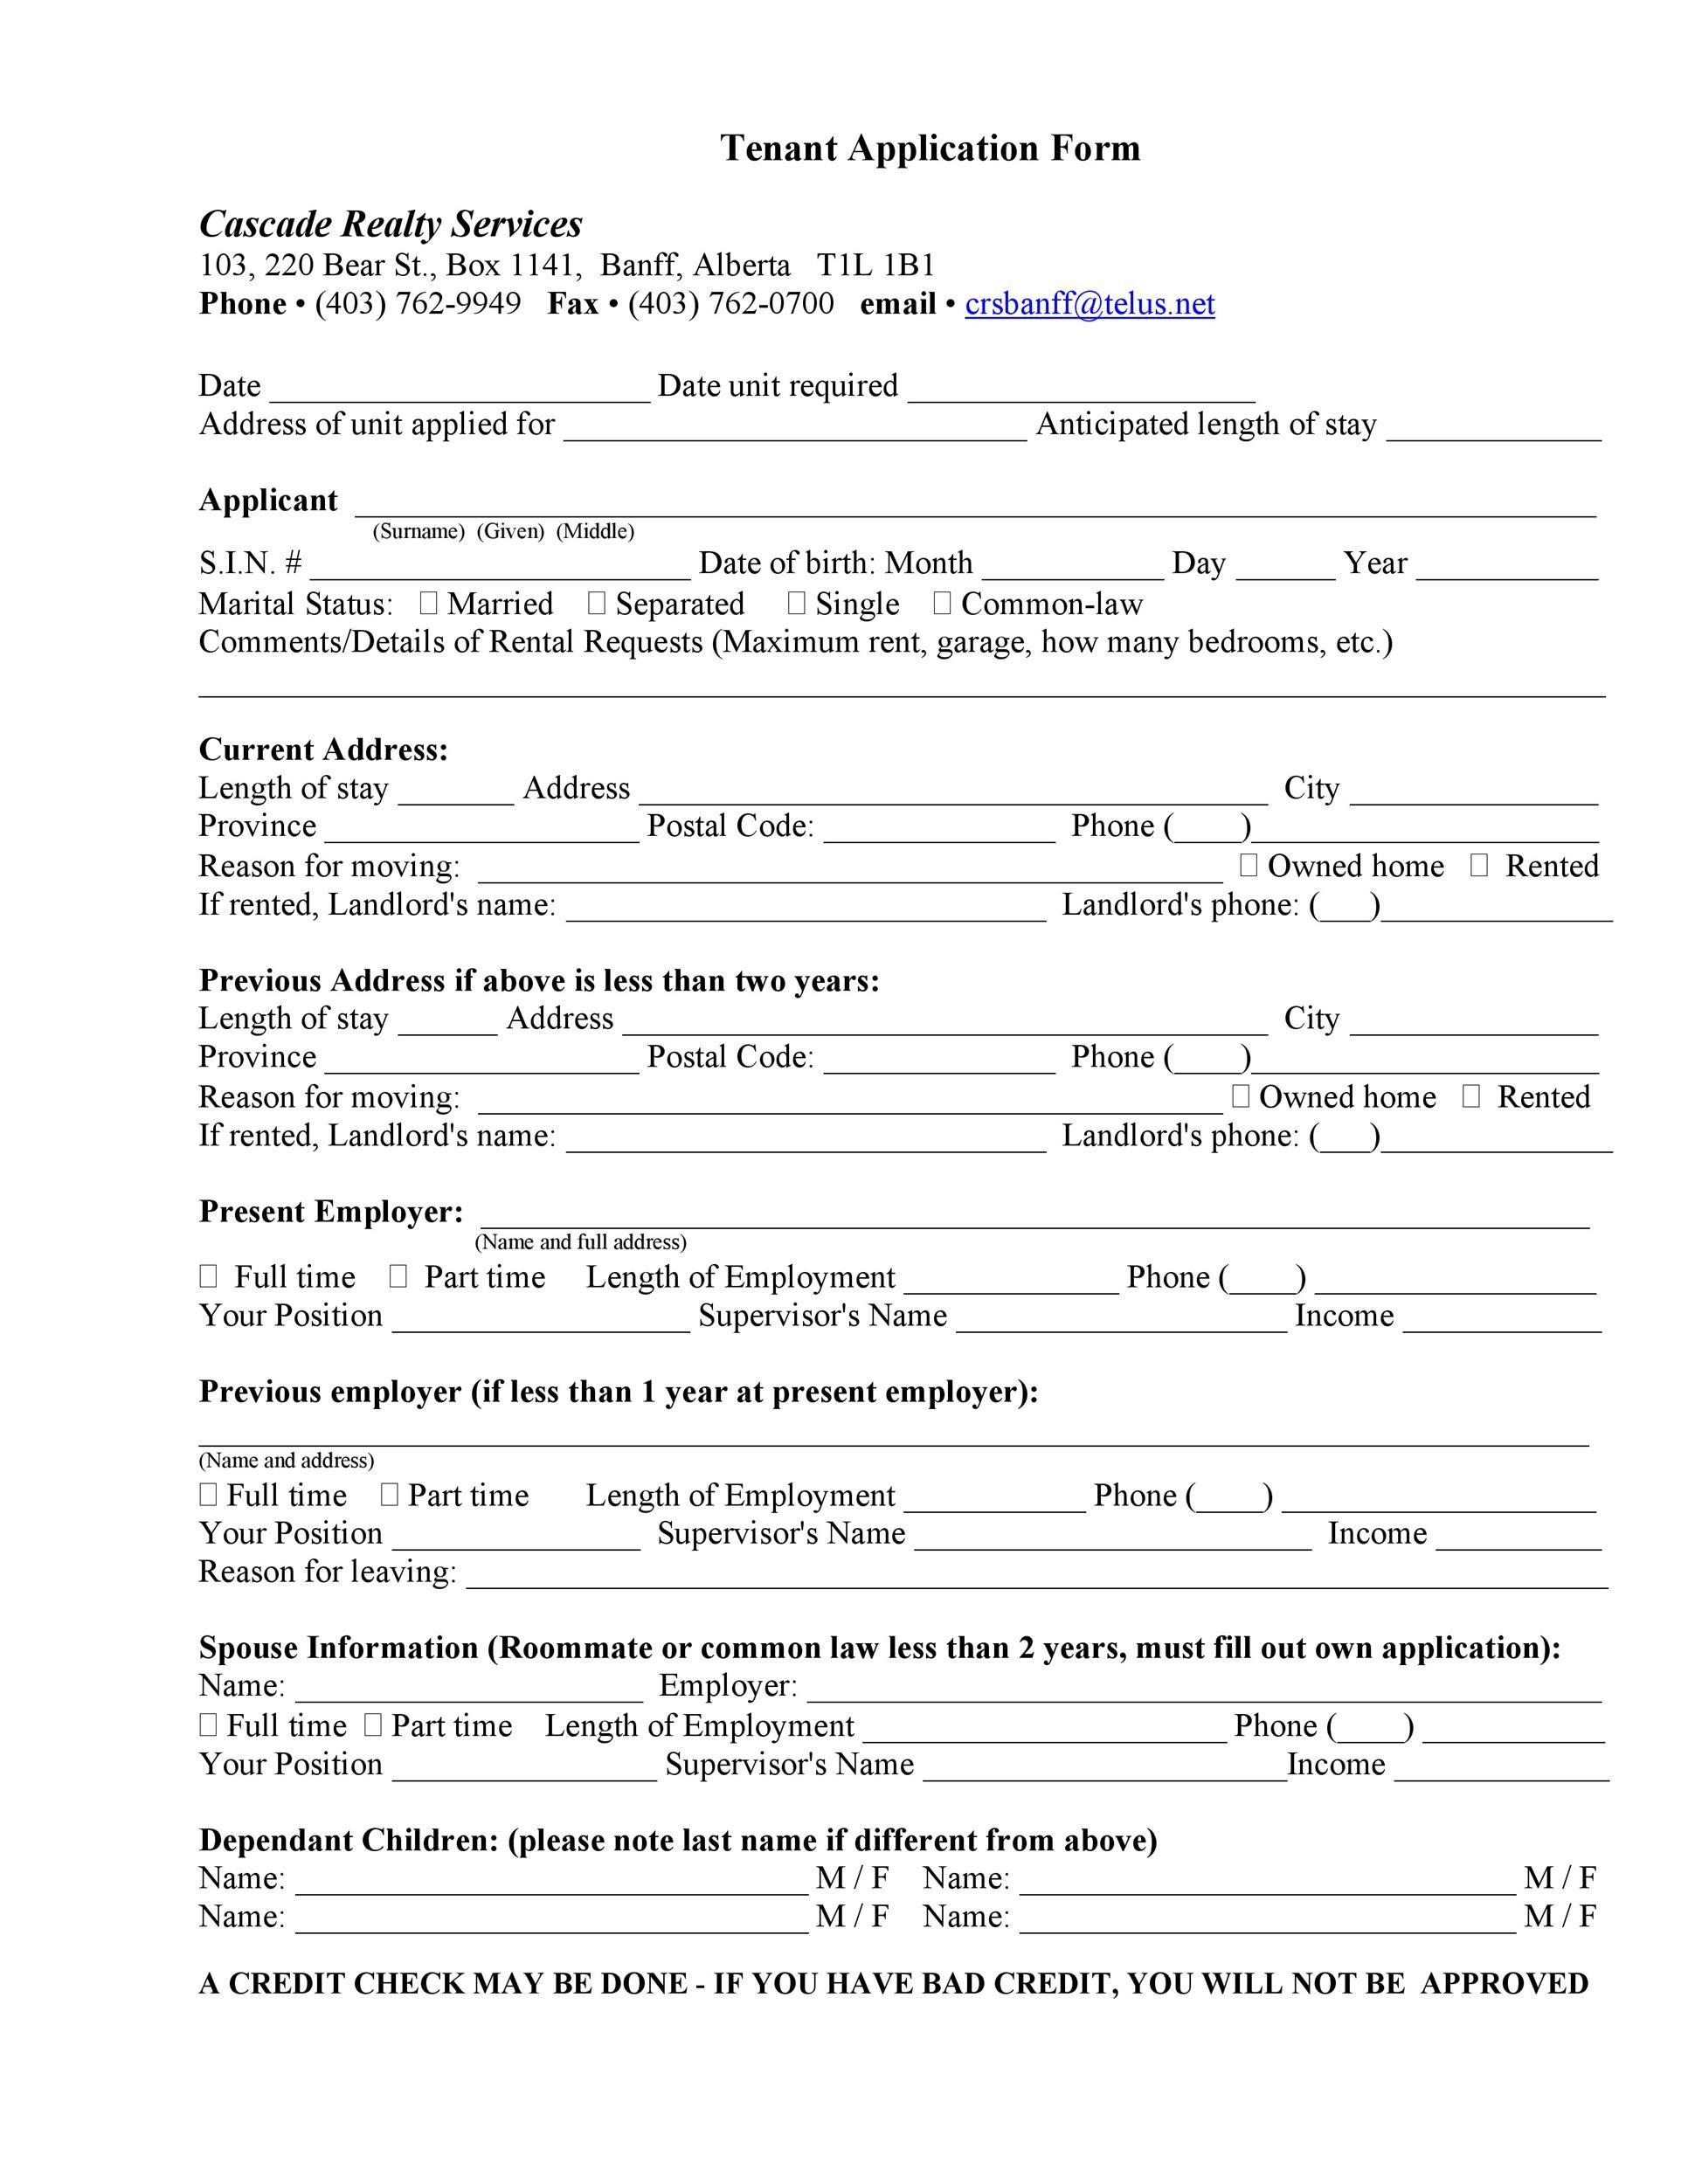 007 Remarkable Free Rental Application Template Highest Quality  Form Oregon Credit OnlineFull